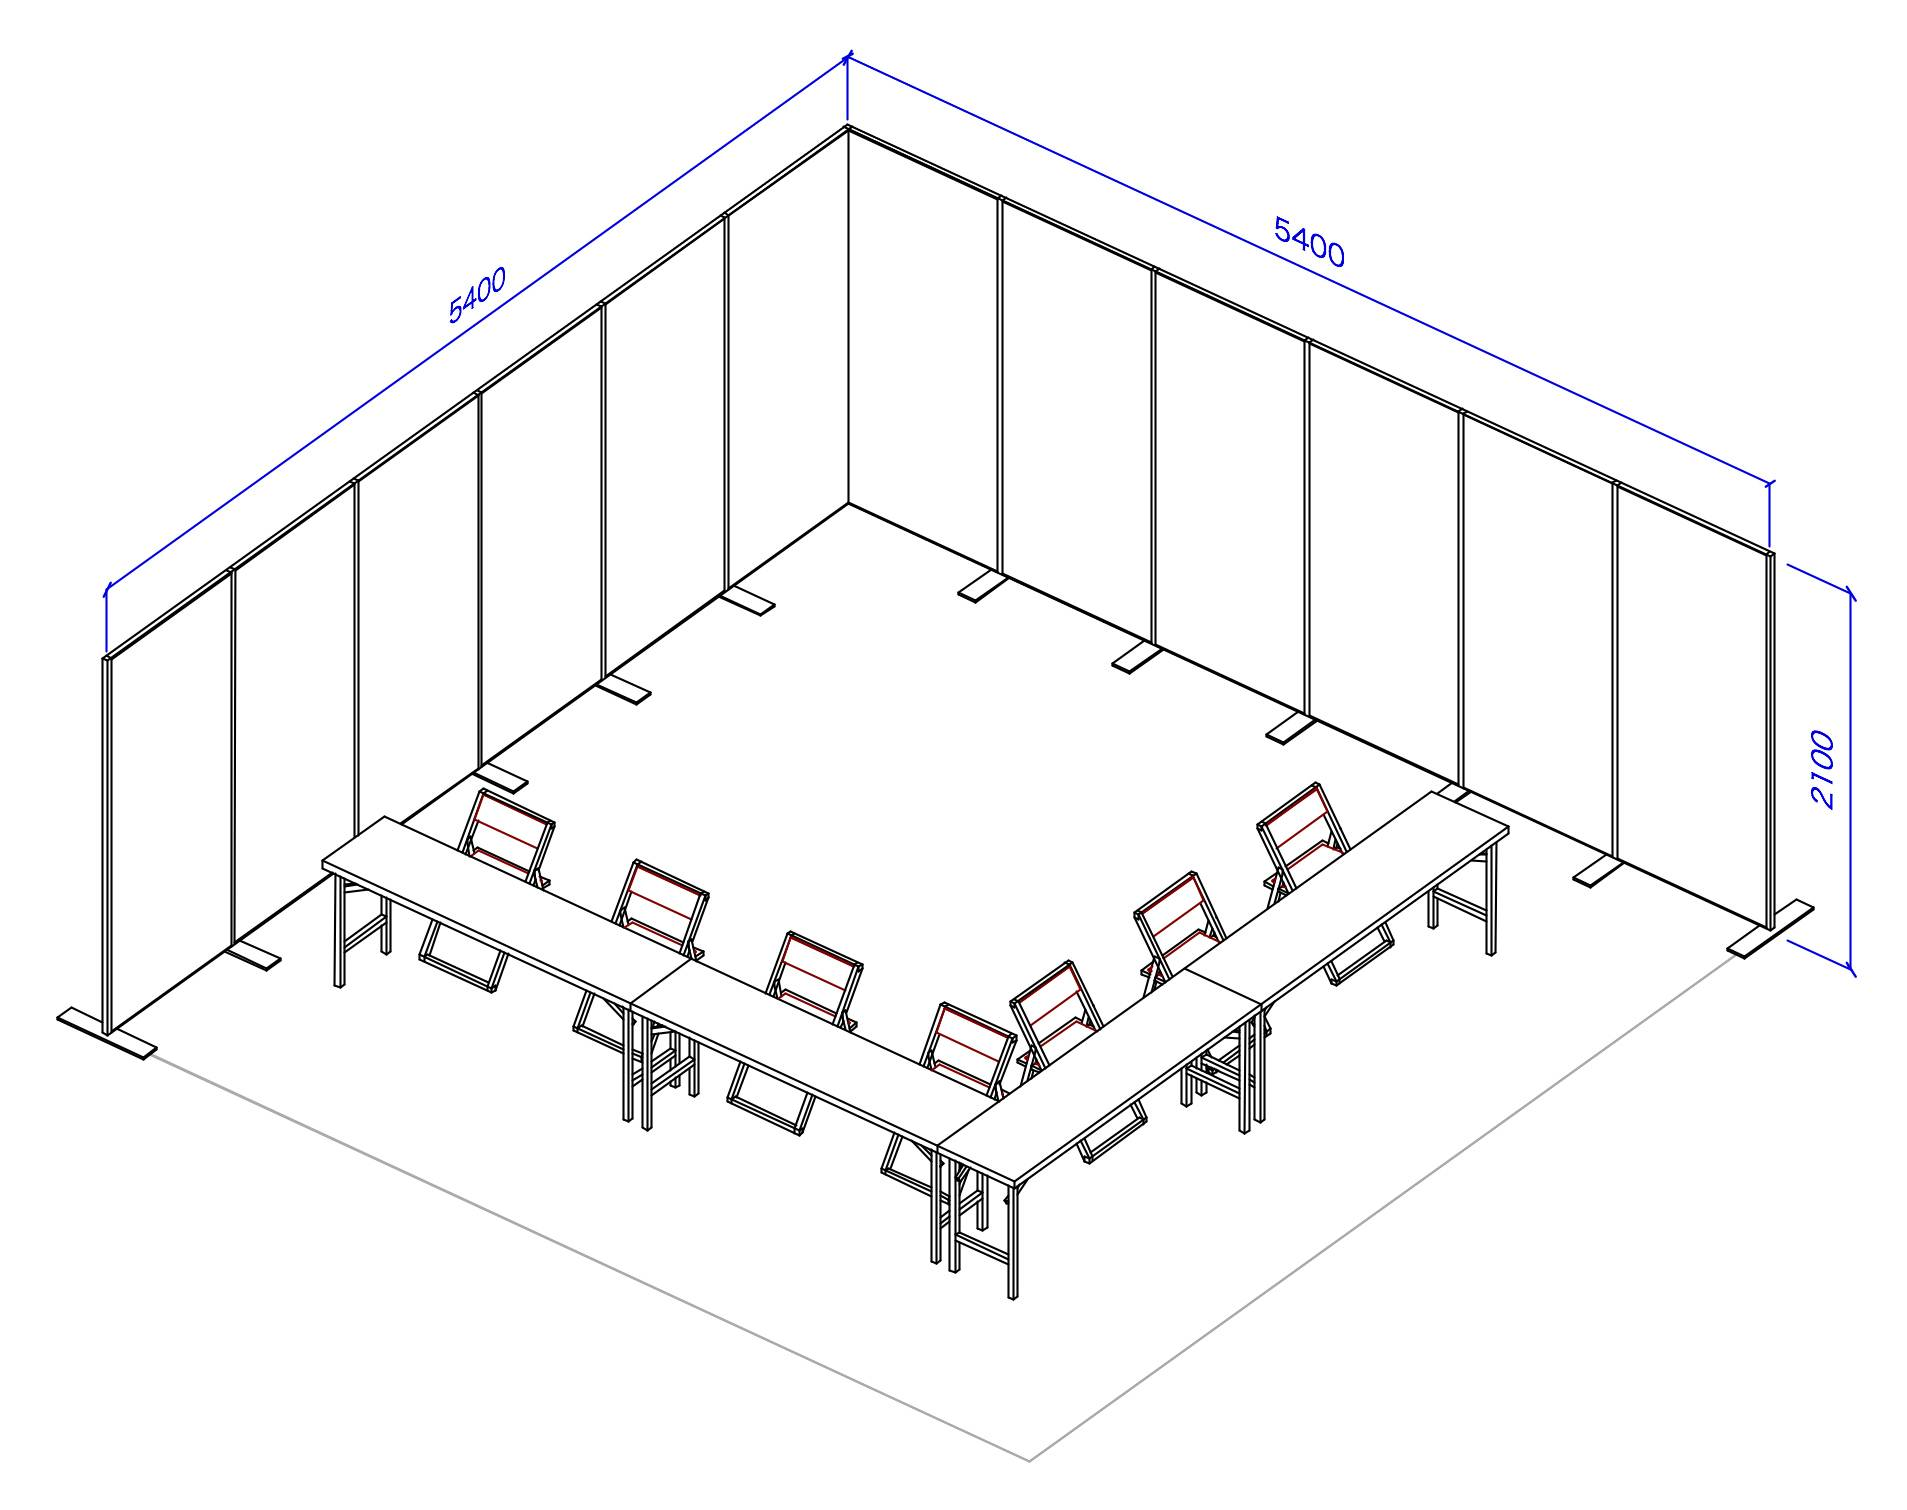 D1 販売スペース4 試遊スペース0